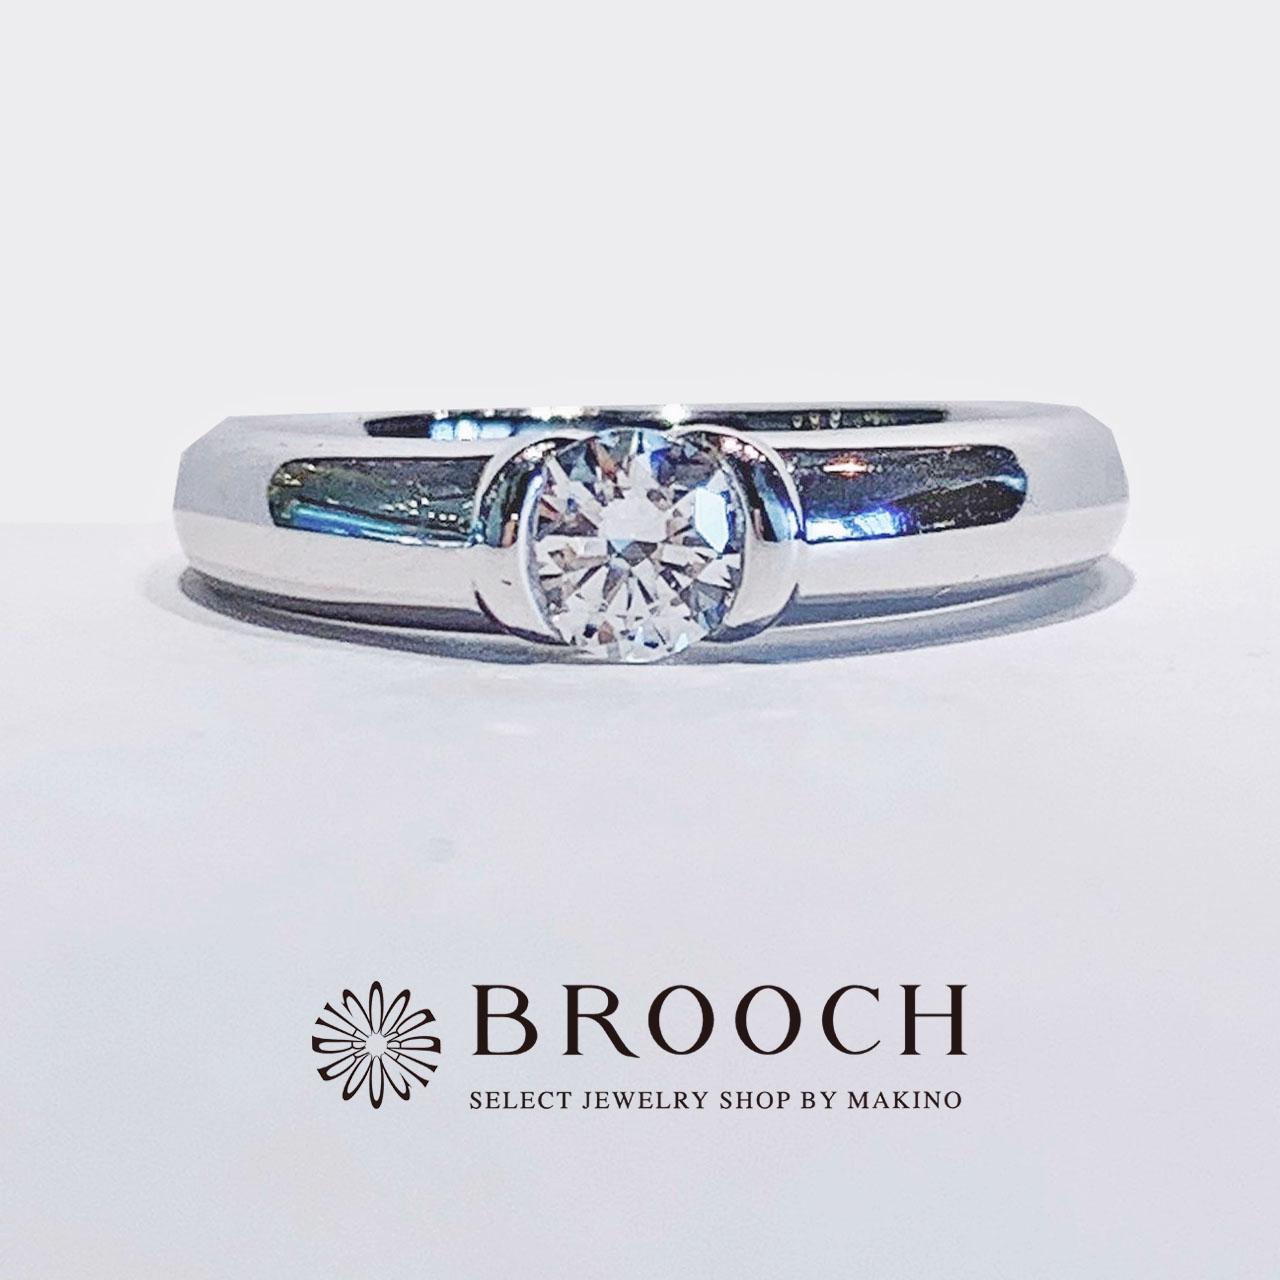 BROOCH 婚約指輪 エンゲージリング かわいい シンプル1石ストレートデザイン